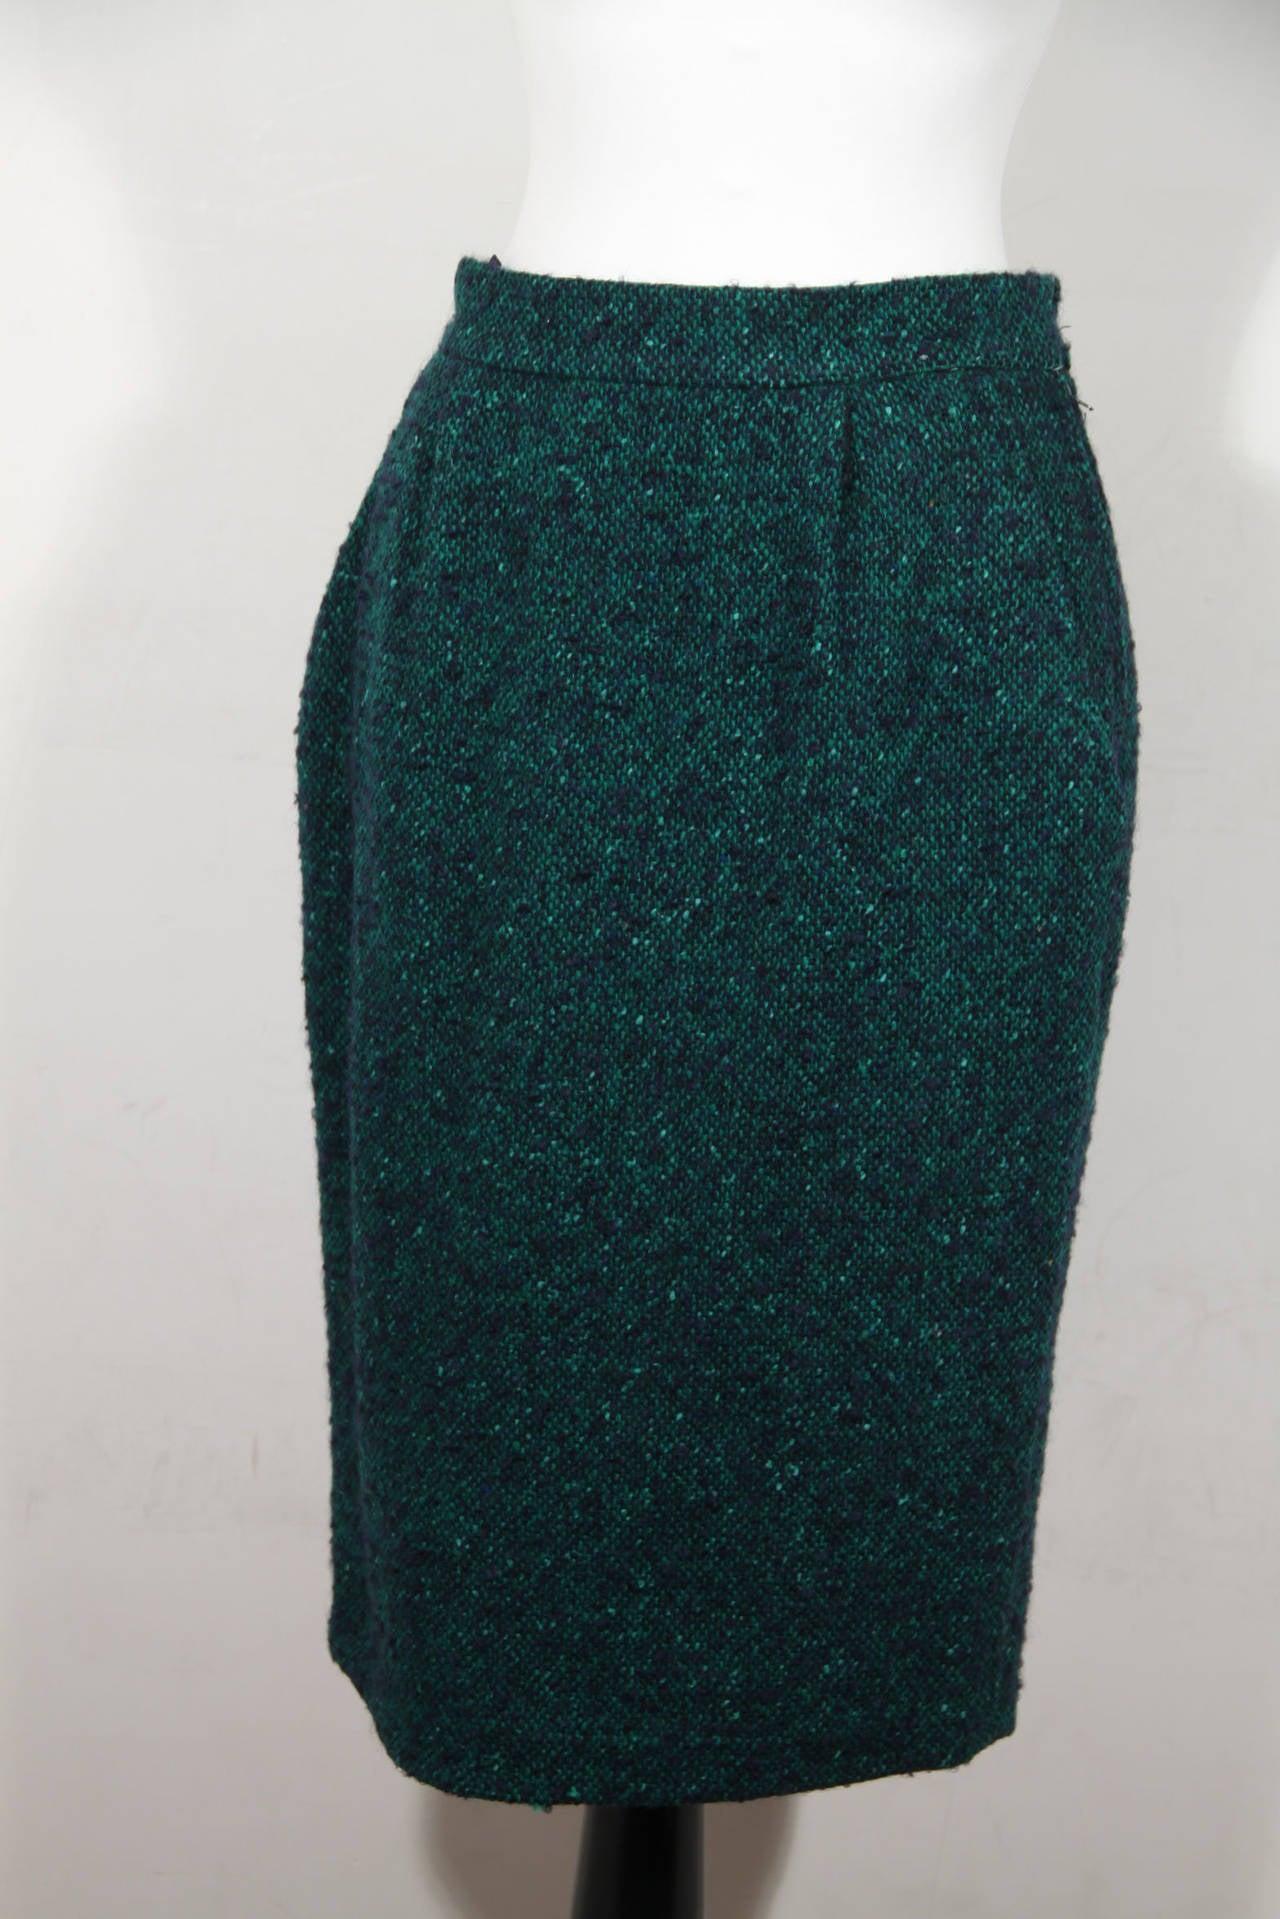 ANDREA ODICINI Italian VINTAGE Green Tweed SUIT Coat & Skirt SET Sz 40 IT For Sale 2